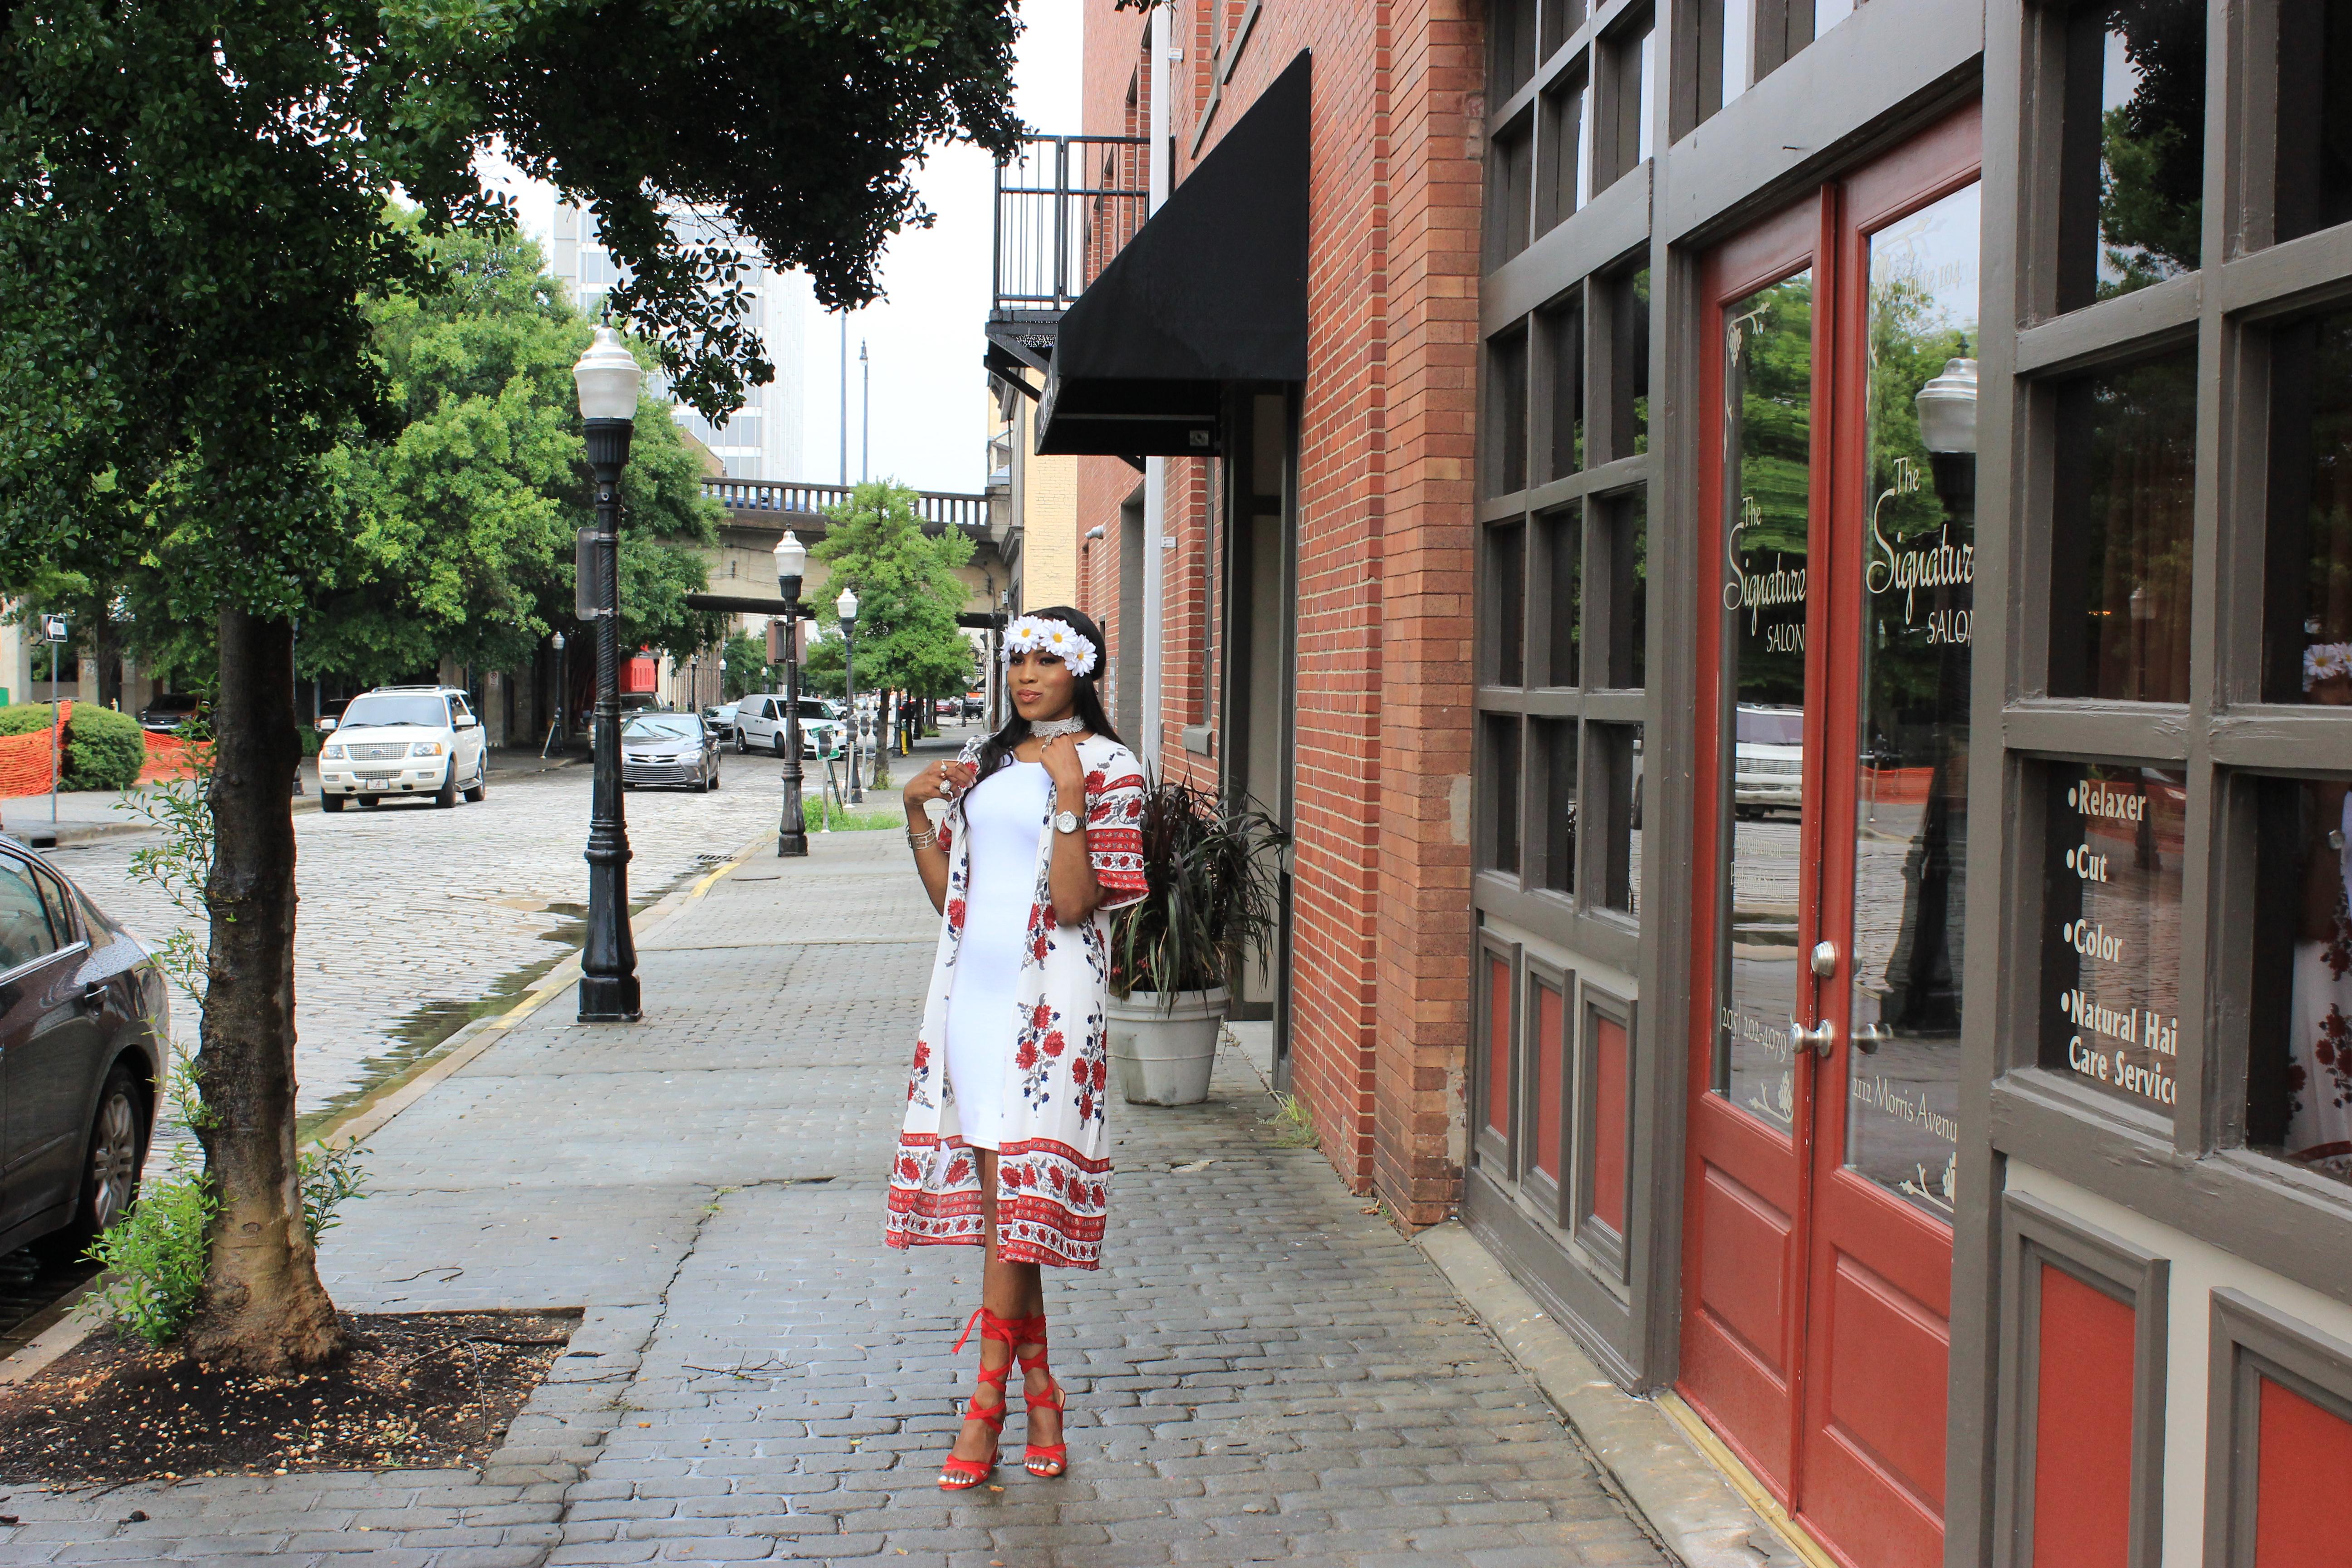 Style-Files-White-forever21-sleeveless-dress-boohoo-Lucy Border Print Maxi Shortsleeve Kimono-Boohoo-ruby-Scalloped Lace Choker-Public-desire-red-lace-uP-heels-forever-21-daisy-headband-oohlalablog-12